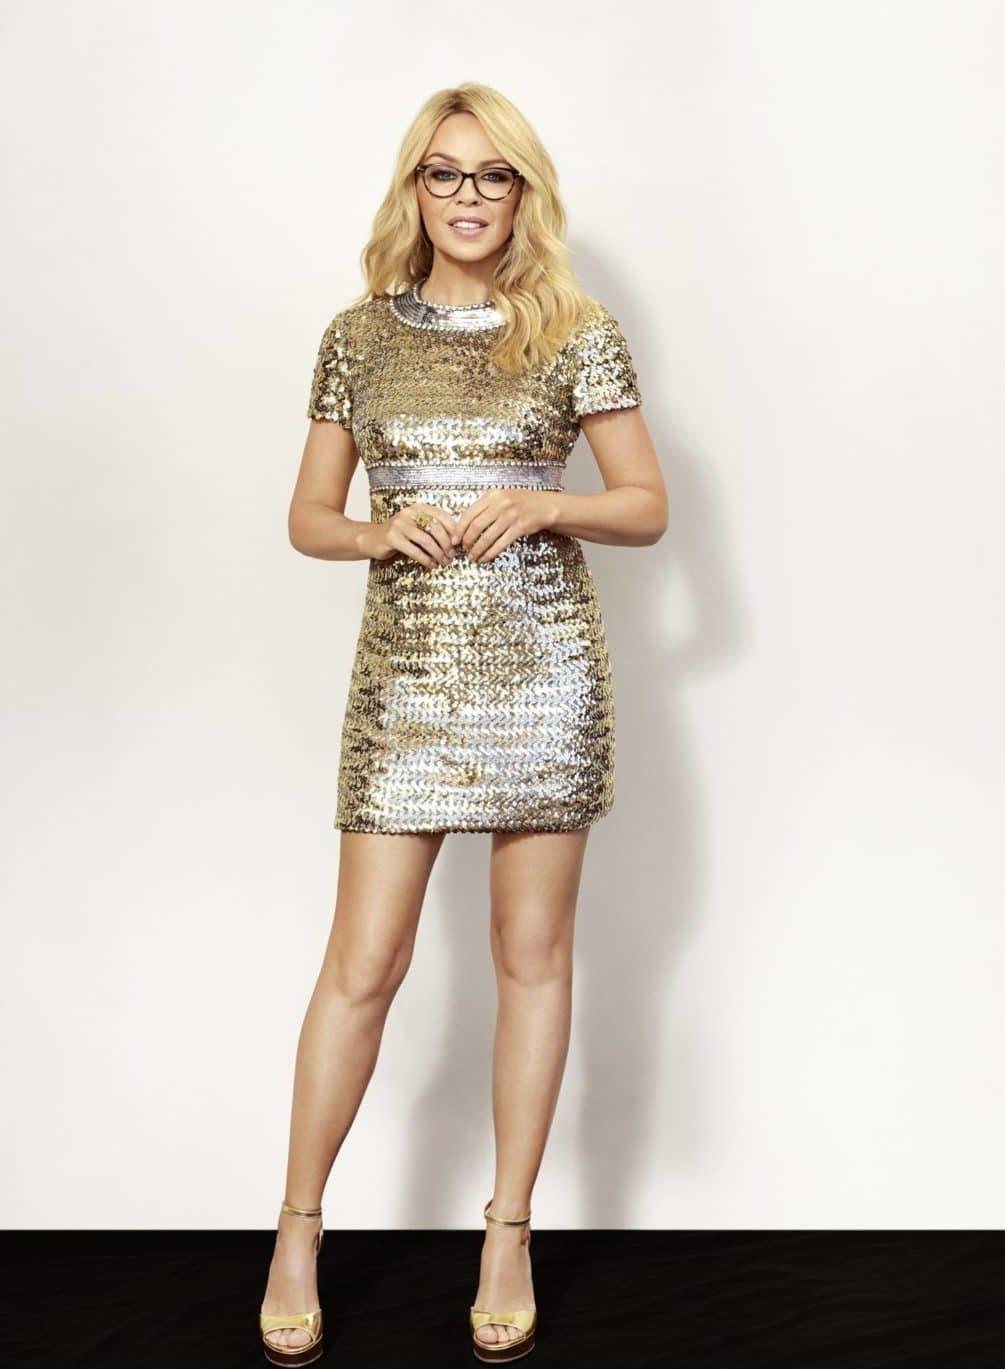 368689c71e Kylie Minogue Glasses Specsavers